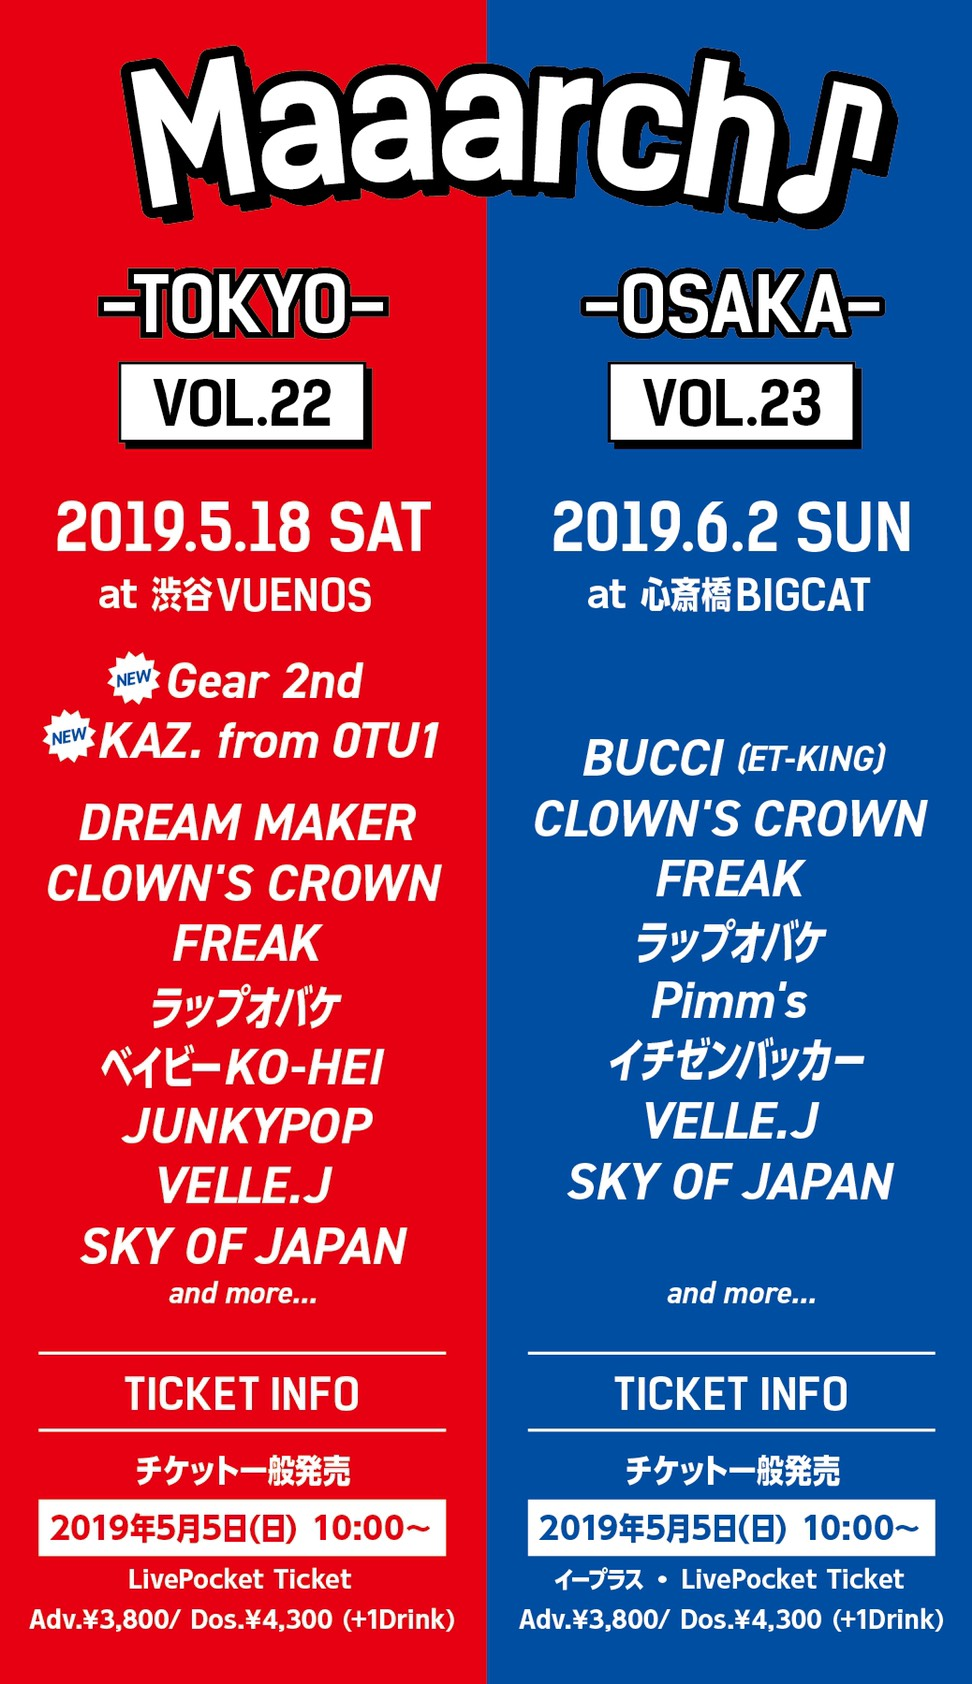 Maaarch♩vol.22 -TOKYO-